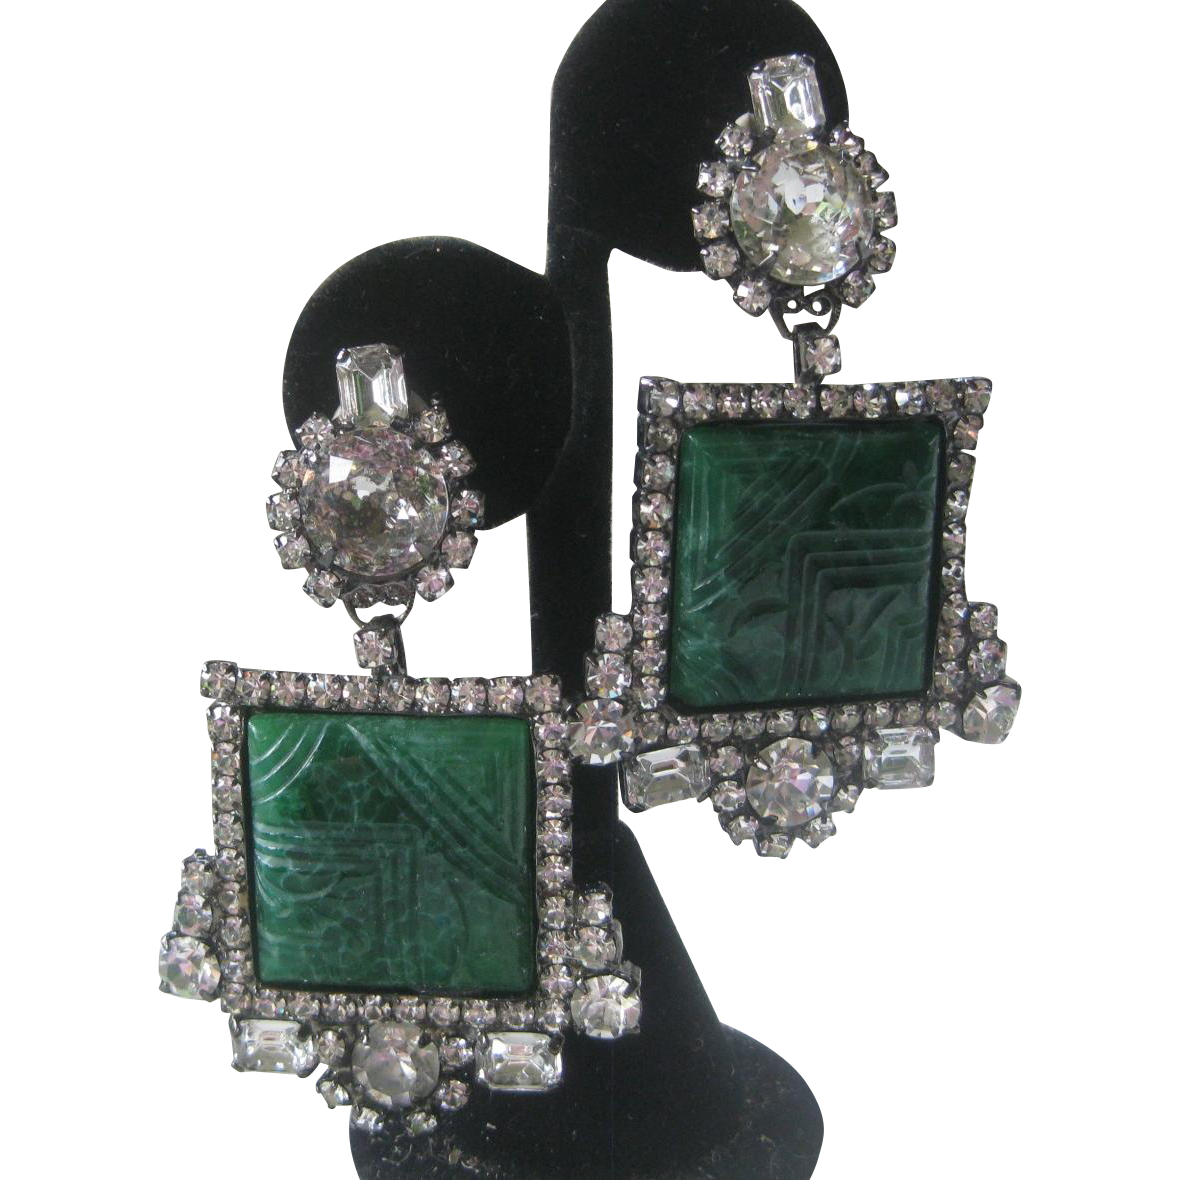 Large Art Deco Carved Glass & Rhinestones Designer 1 Of A Kind Earrings